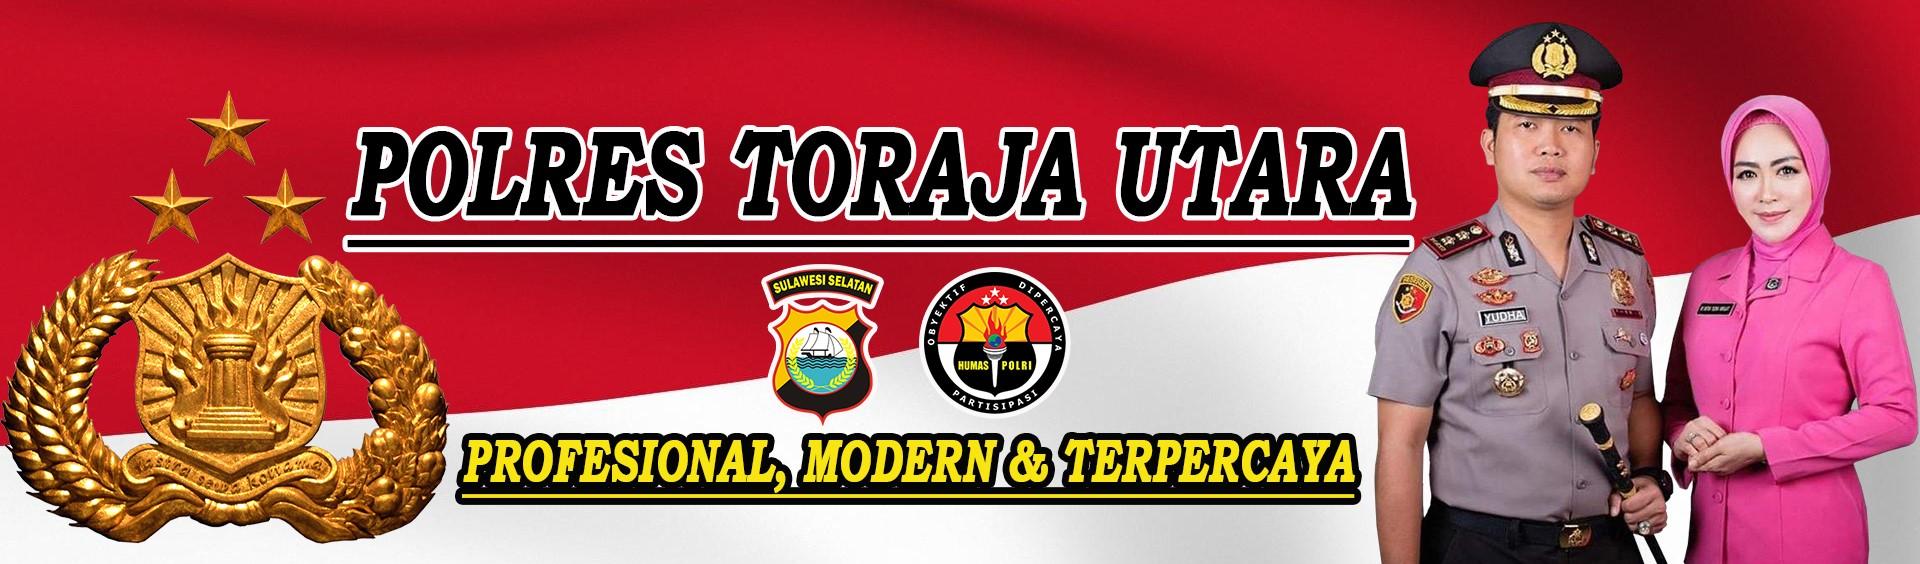 POLRES TORAJA UTARA